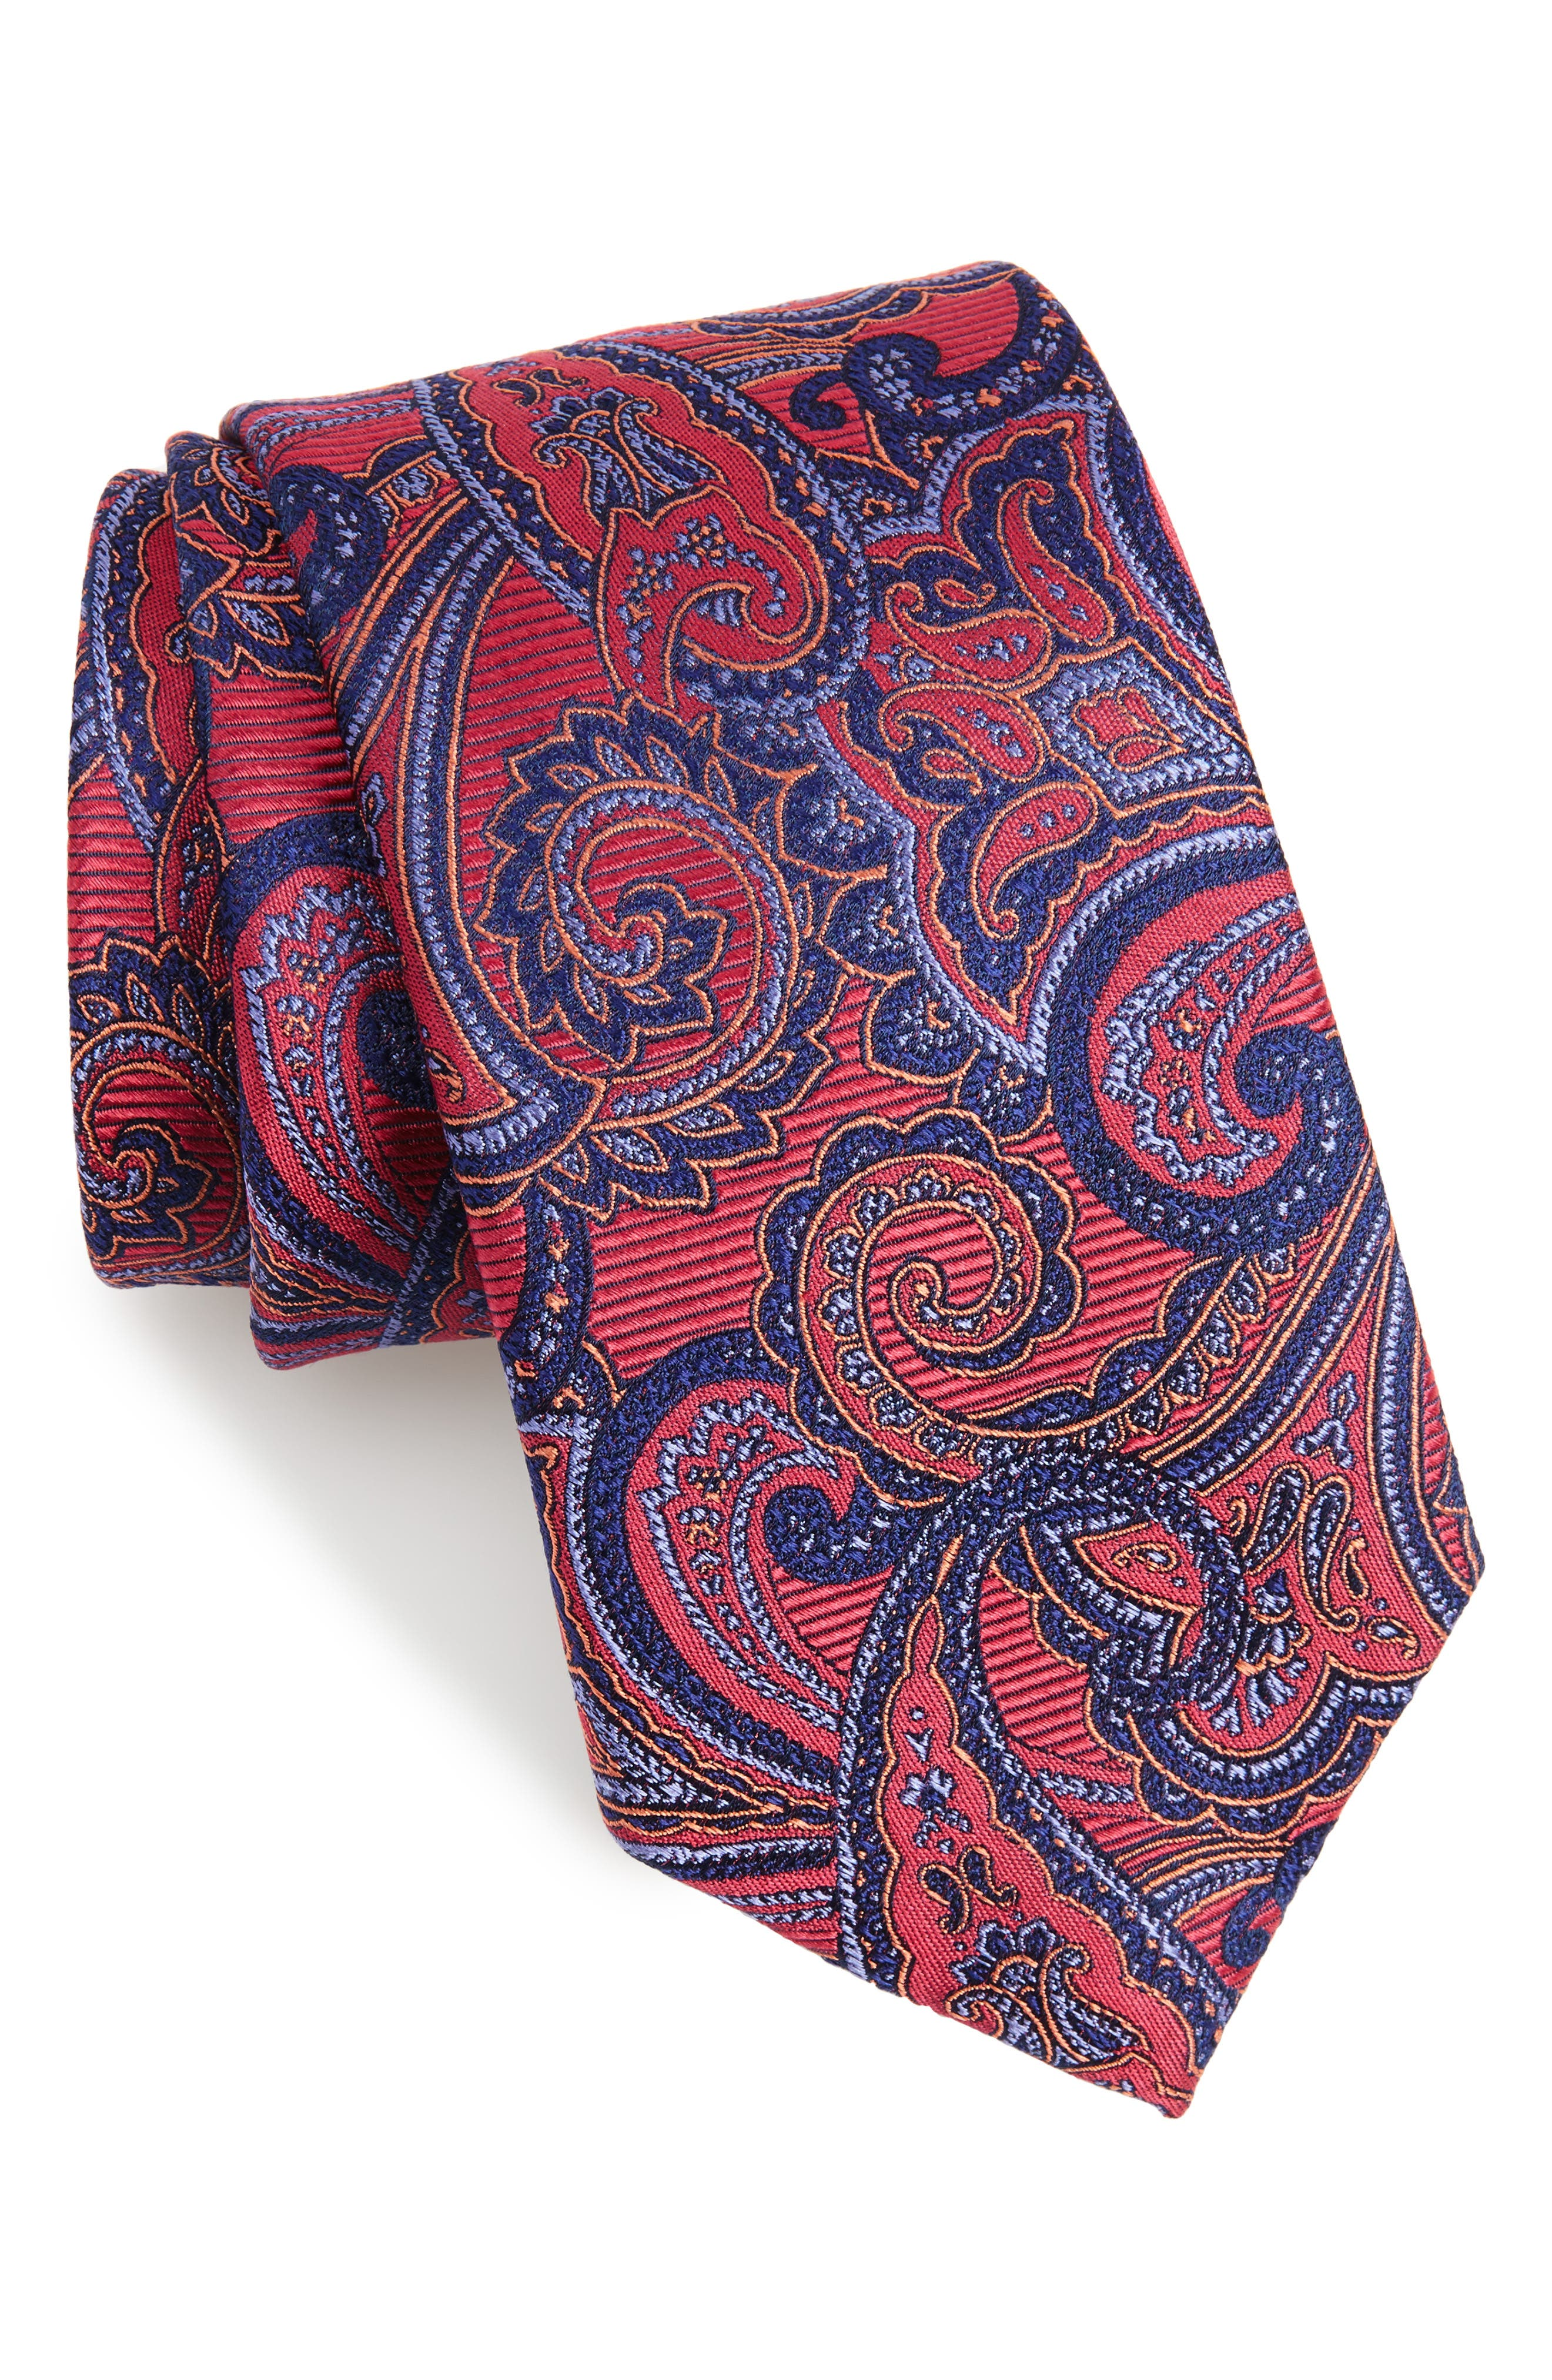 Nordstrom Men's Shop Avalon Paisley Silk Tie (X-Long)